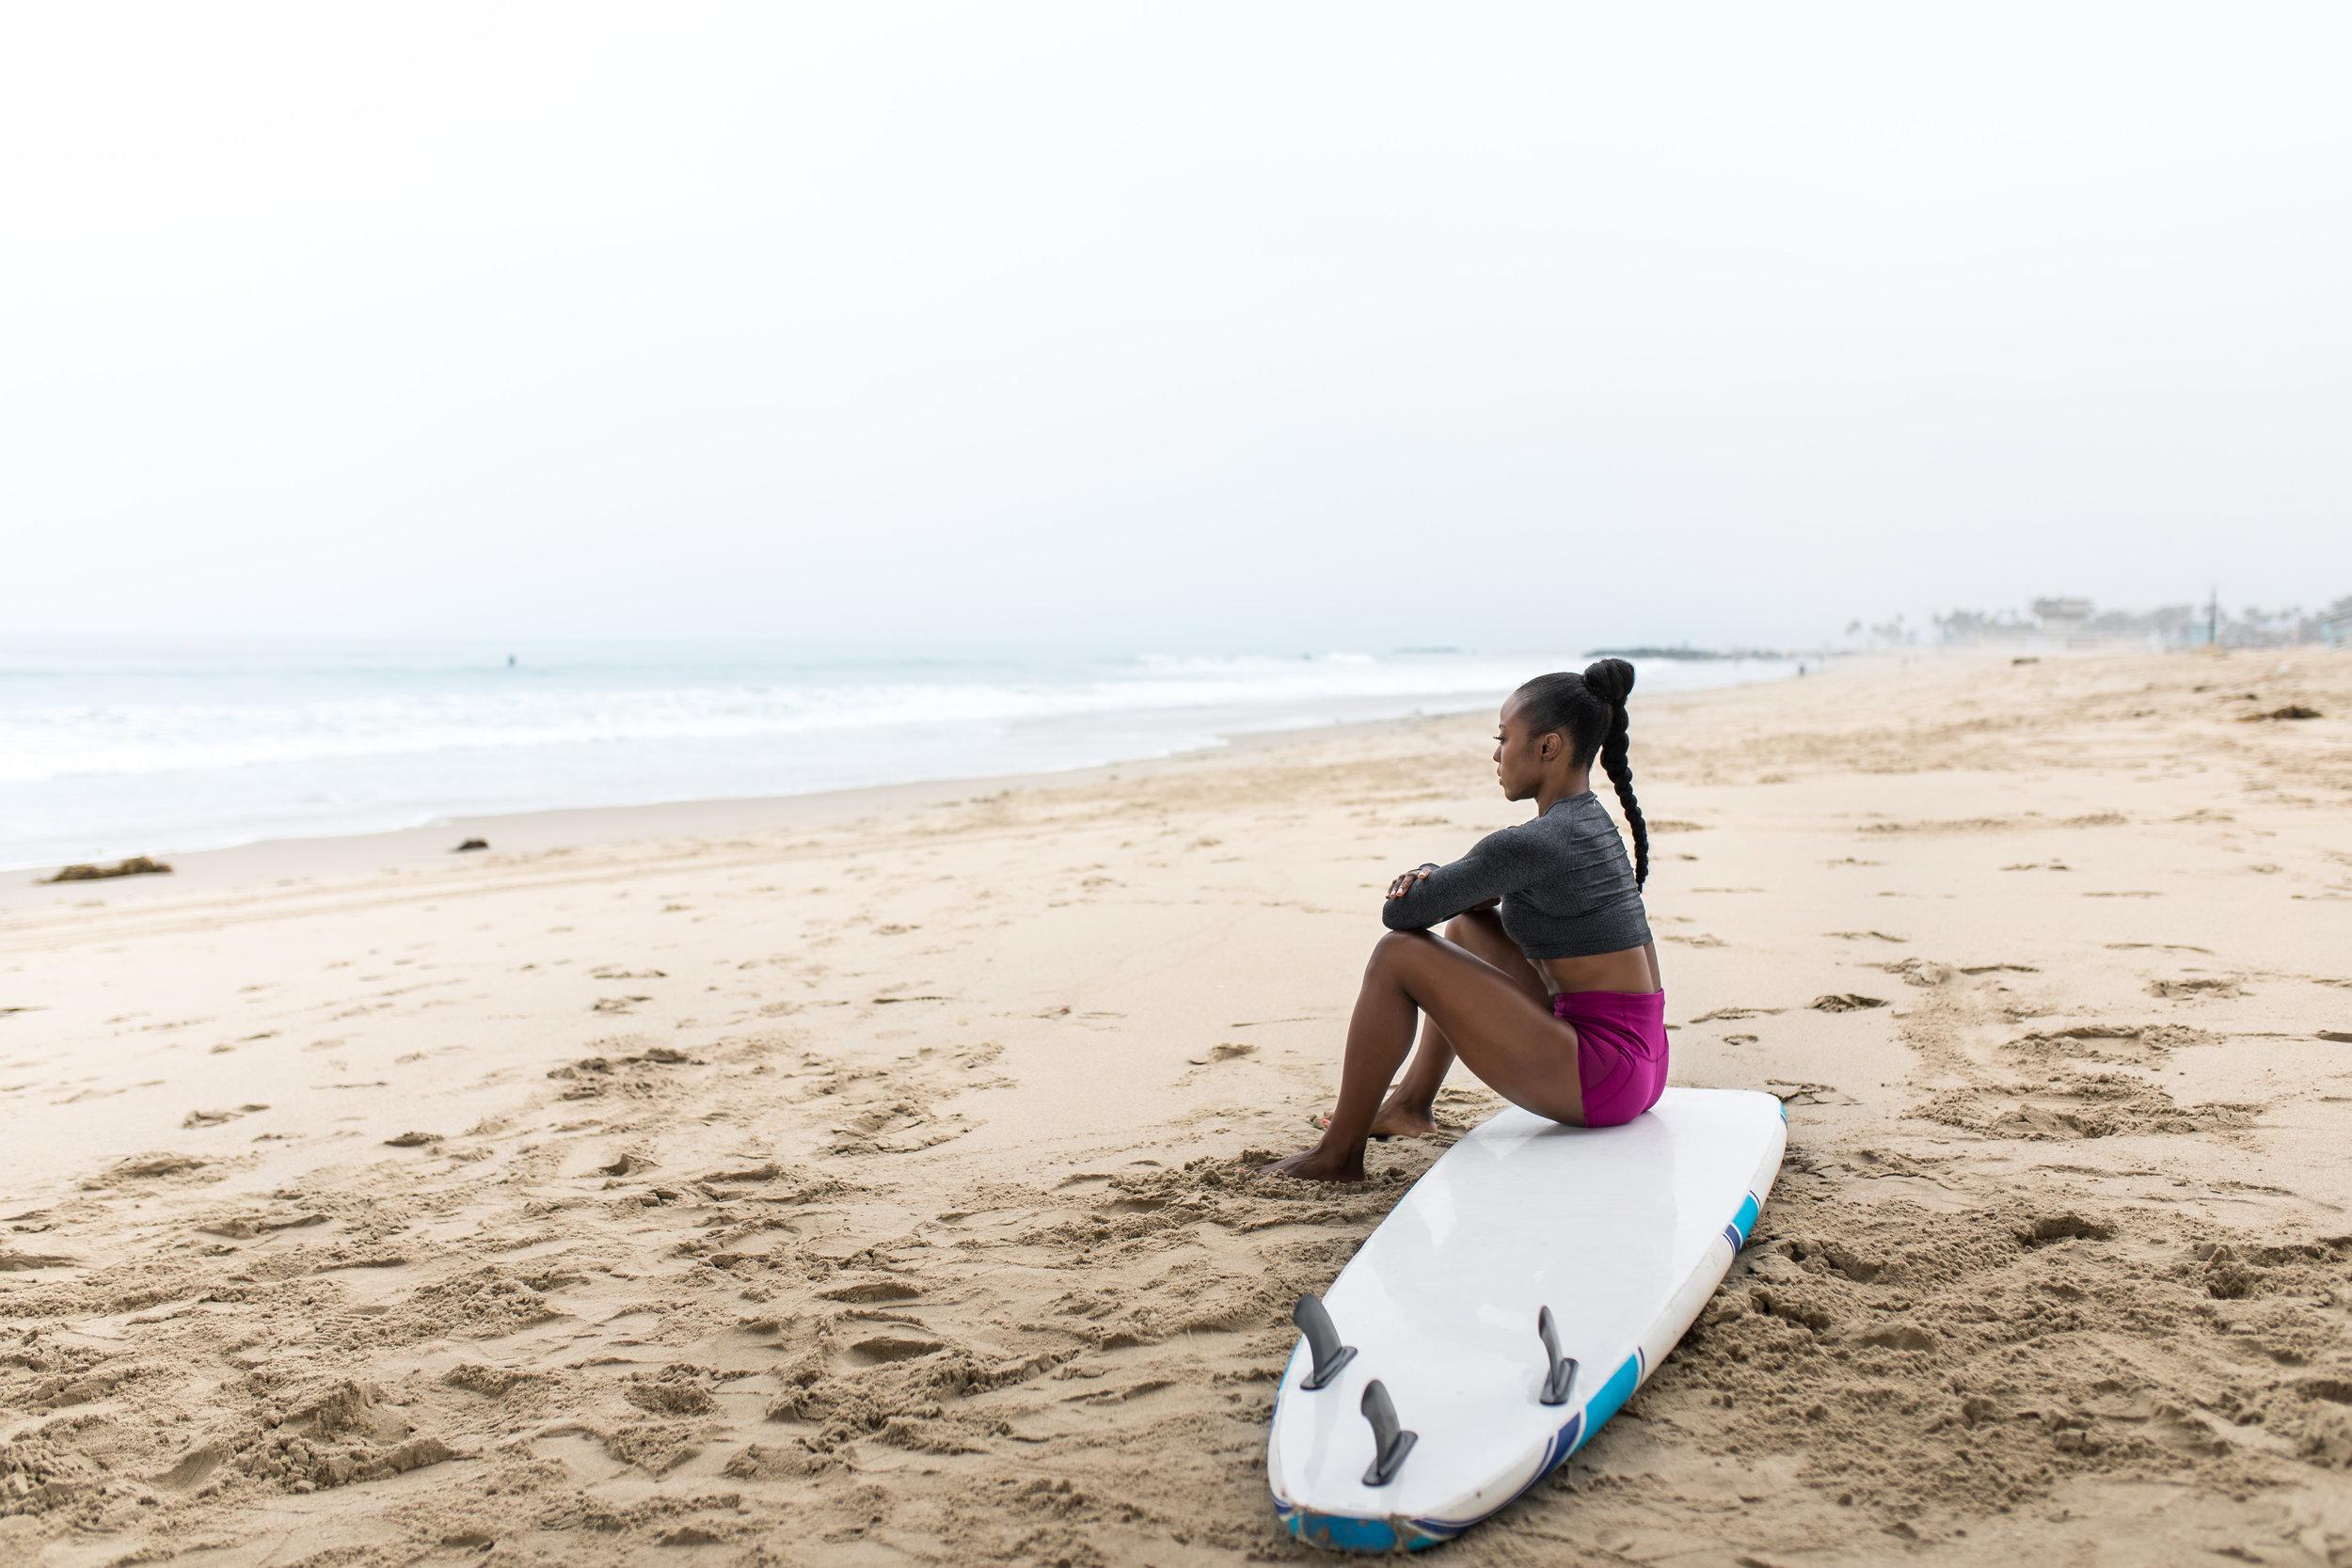 Livestrong_Surf Workout-9.JPG